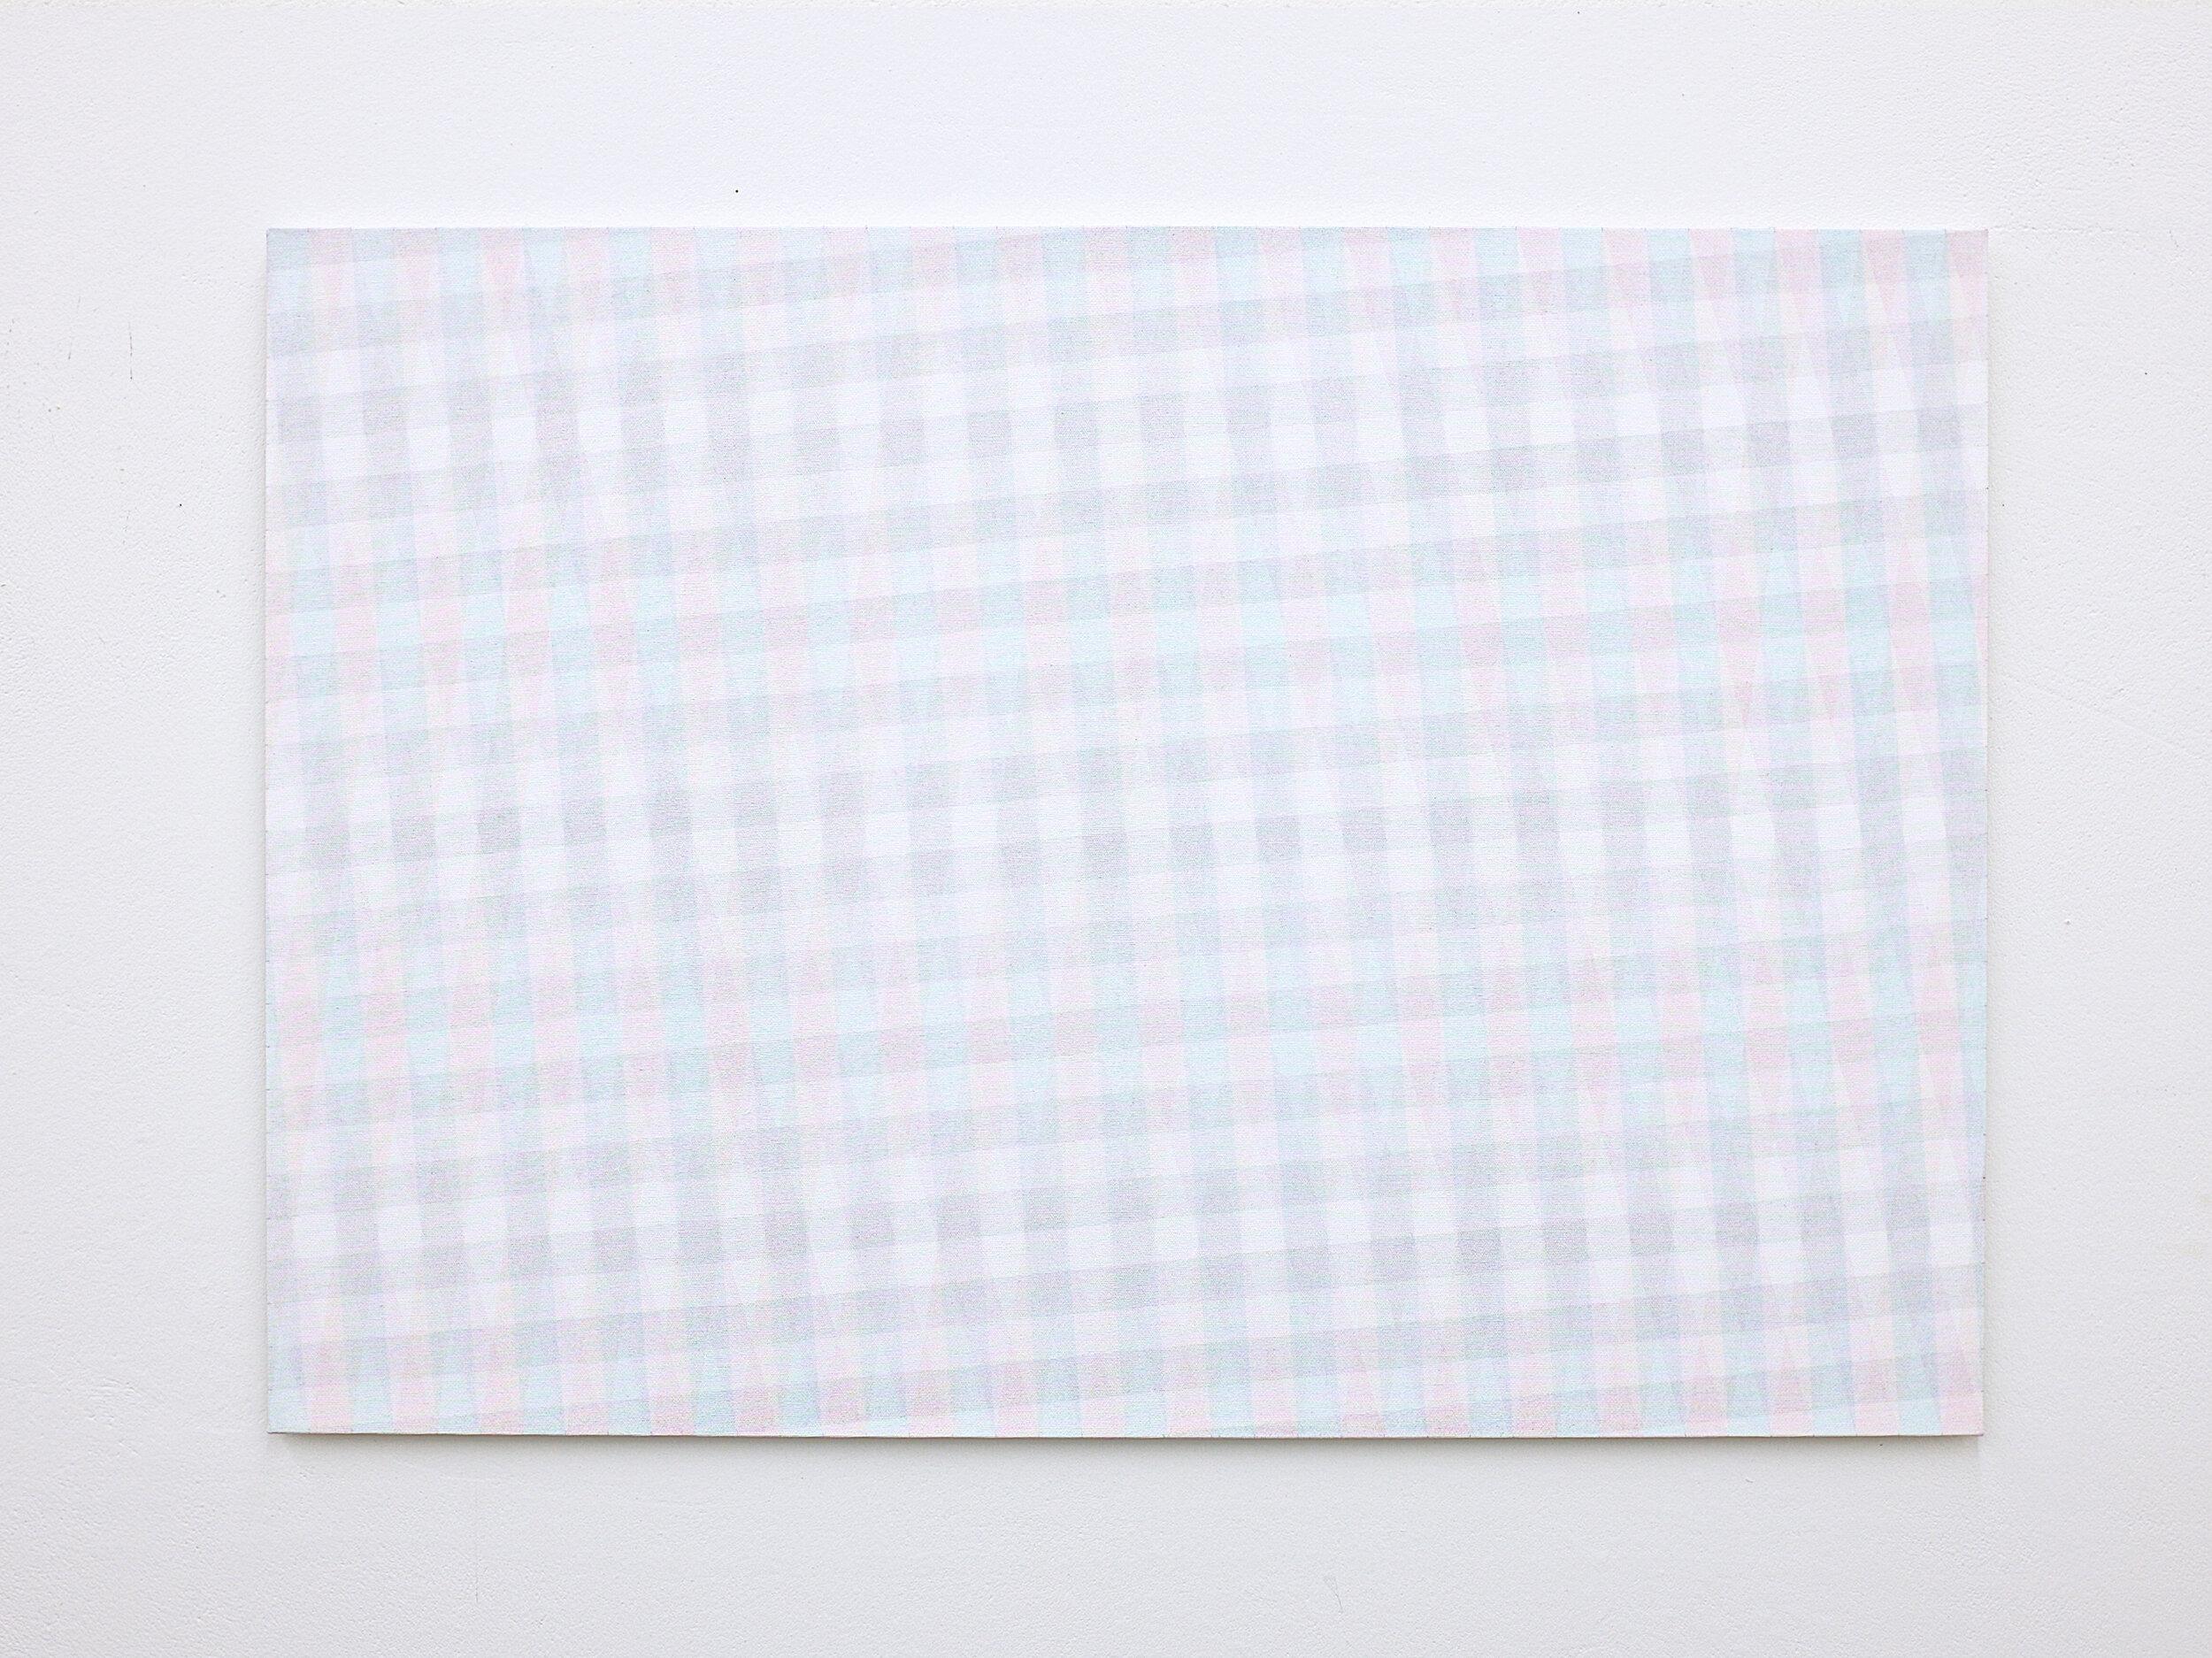 bild nr. 11/2019 - 70 x 100cm - acryl auf baumwolle/alu